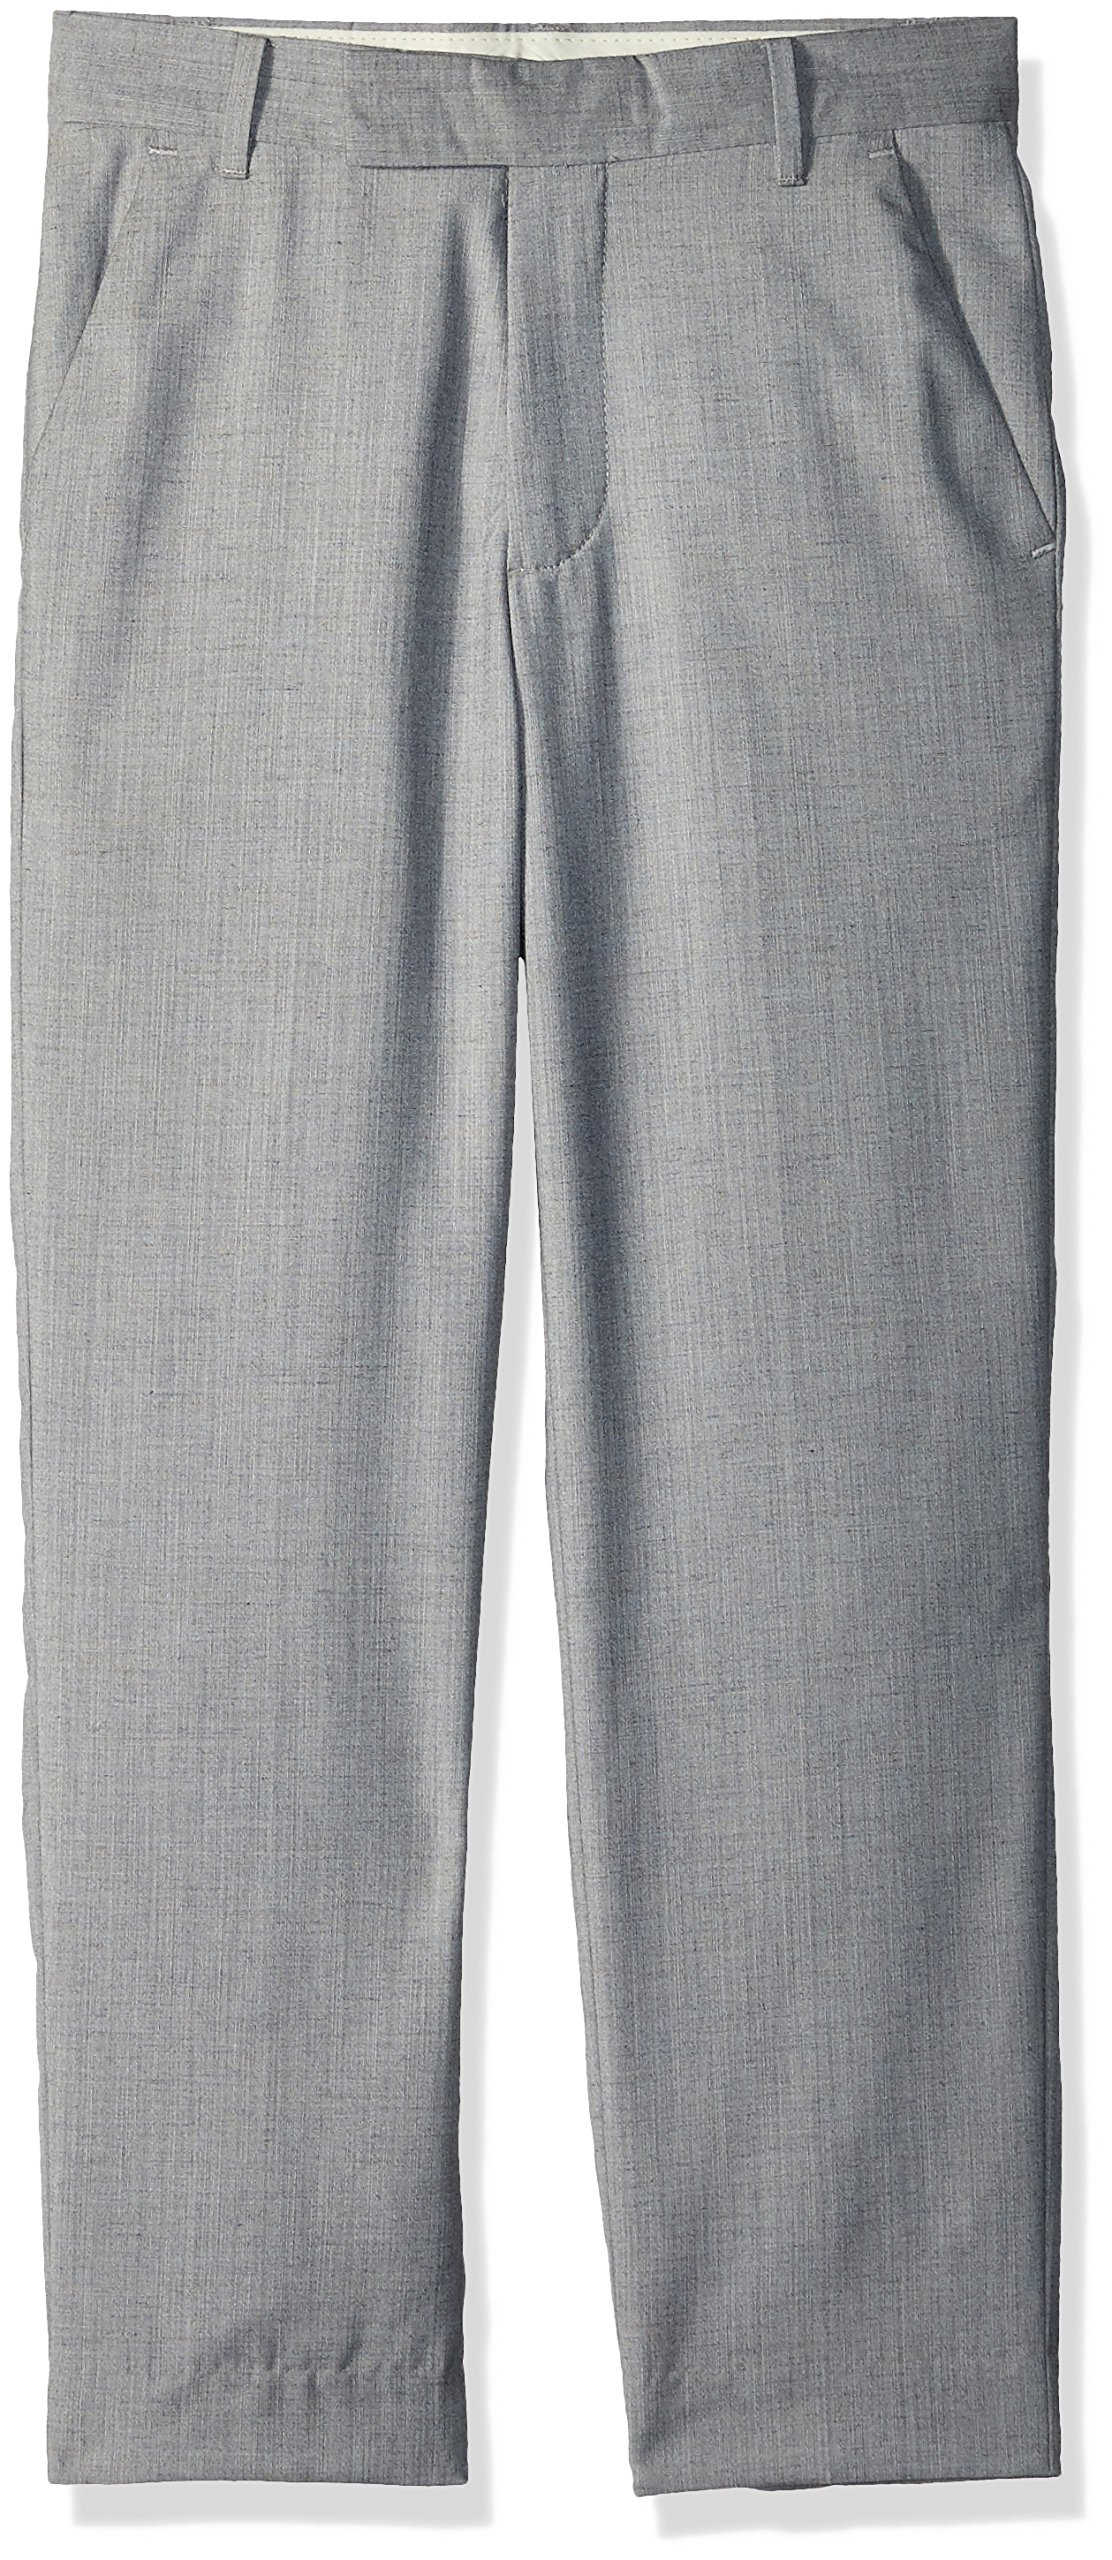 Calvin Klein Big Boys' Flat Front Dress Pant, Textured Linen Grey, 18